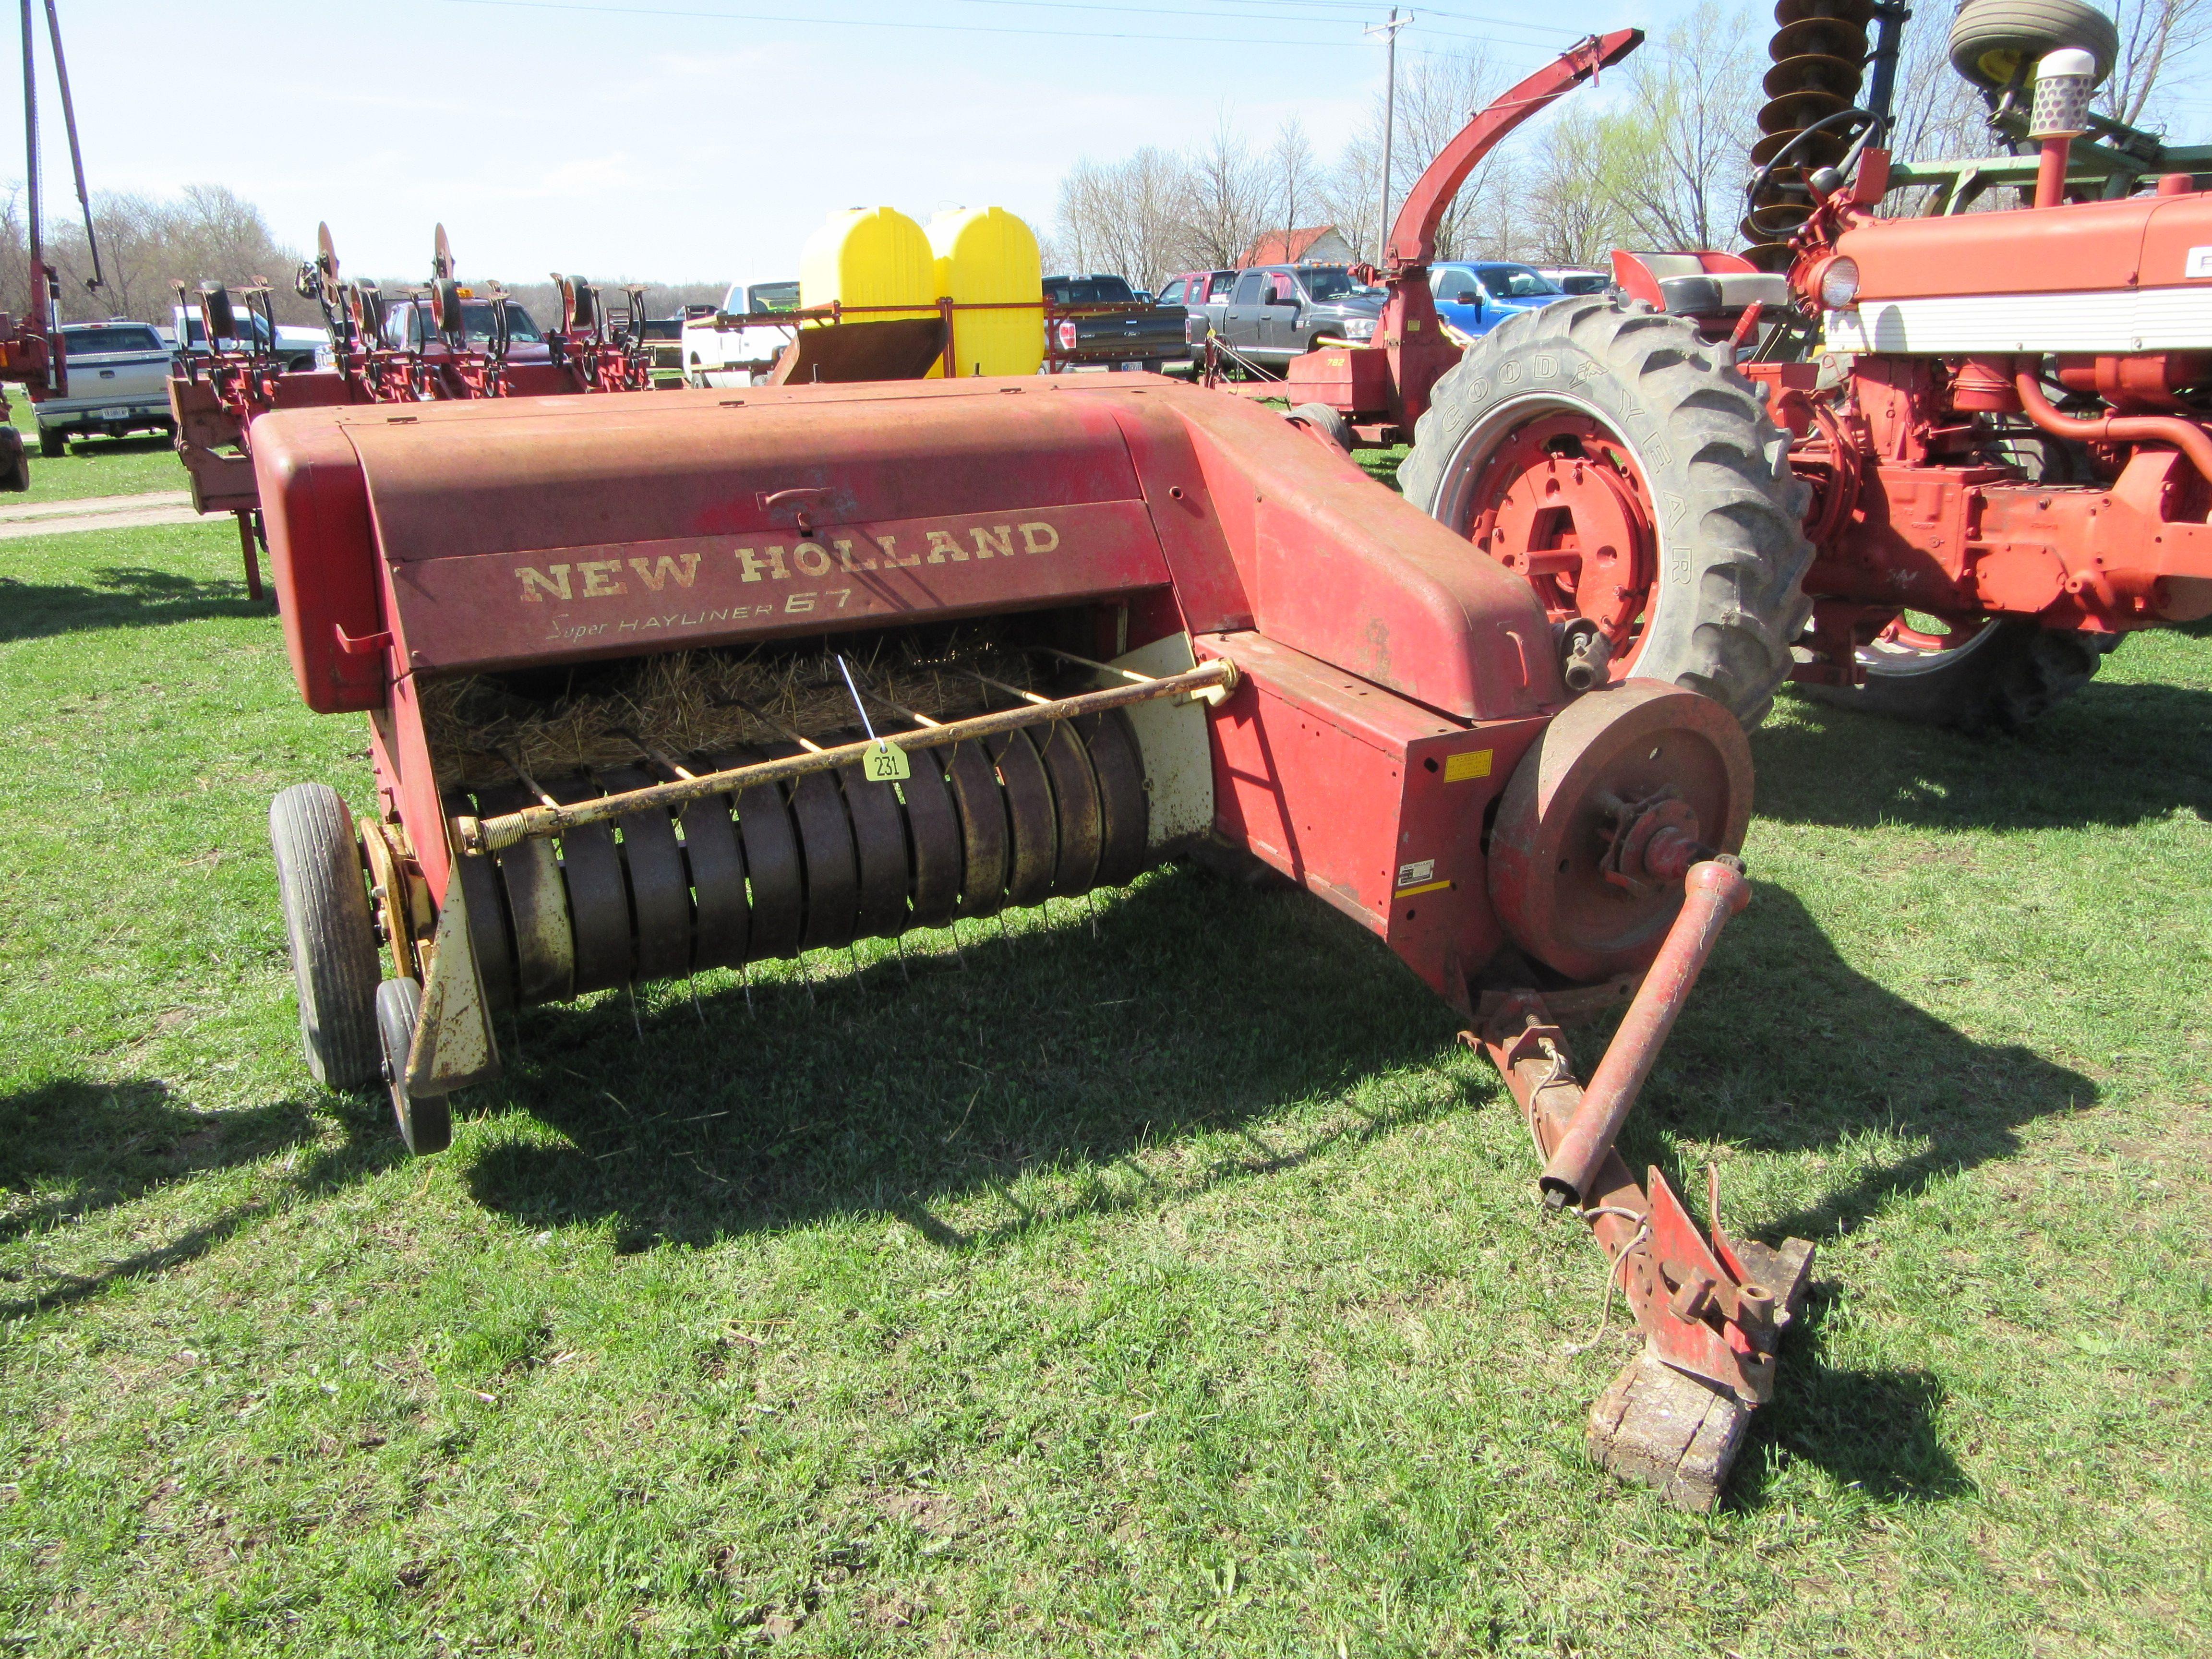 1b0a0fd8fdf7 New HOlland 67 Super Hayliner baler Baler, New Holland, Vintage Farm, Hay,